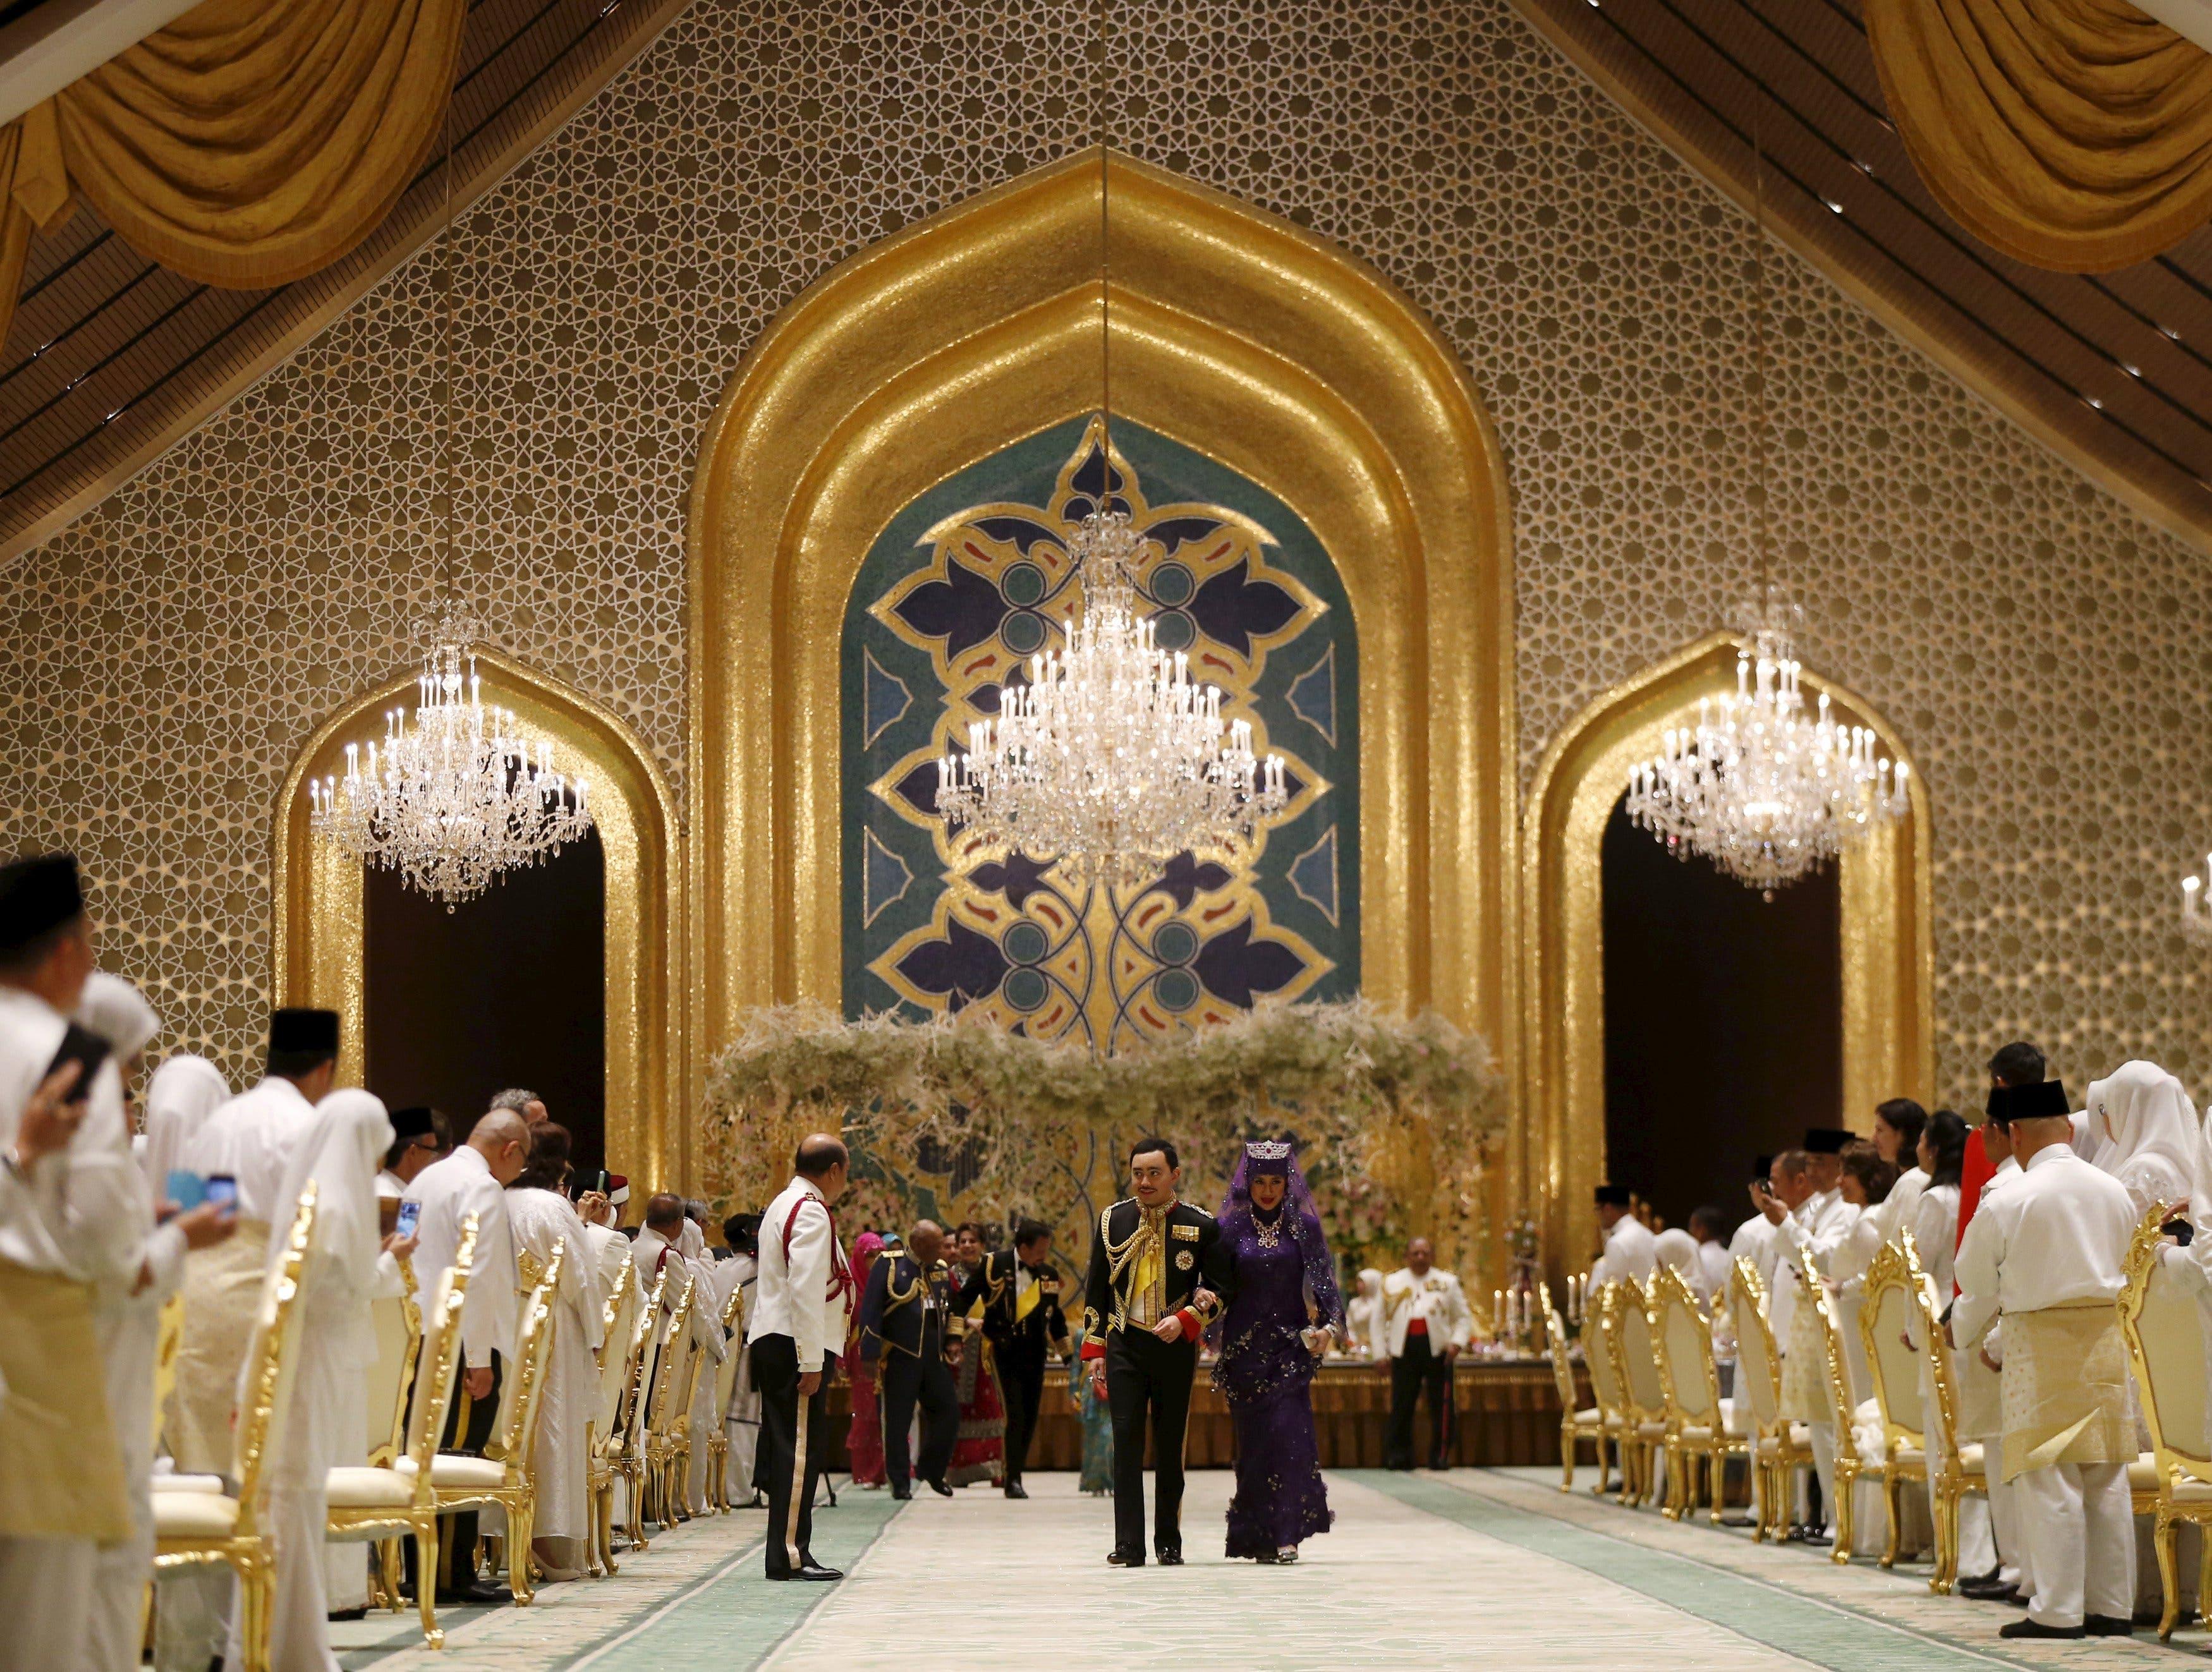 Brunei's newly wed royal couple, Prince Abdul Malik and Dayangku Raabi'atul 'Adawiyyah Pengiran Haji Bolkiah, leave the royal wedding banquet at the Nurul Iman Palace in Bandar Seri Begawan April 12, 2015. (Reuters)